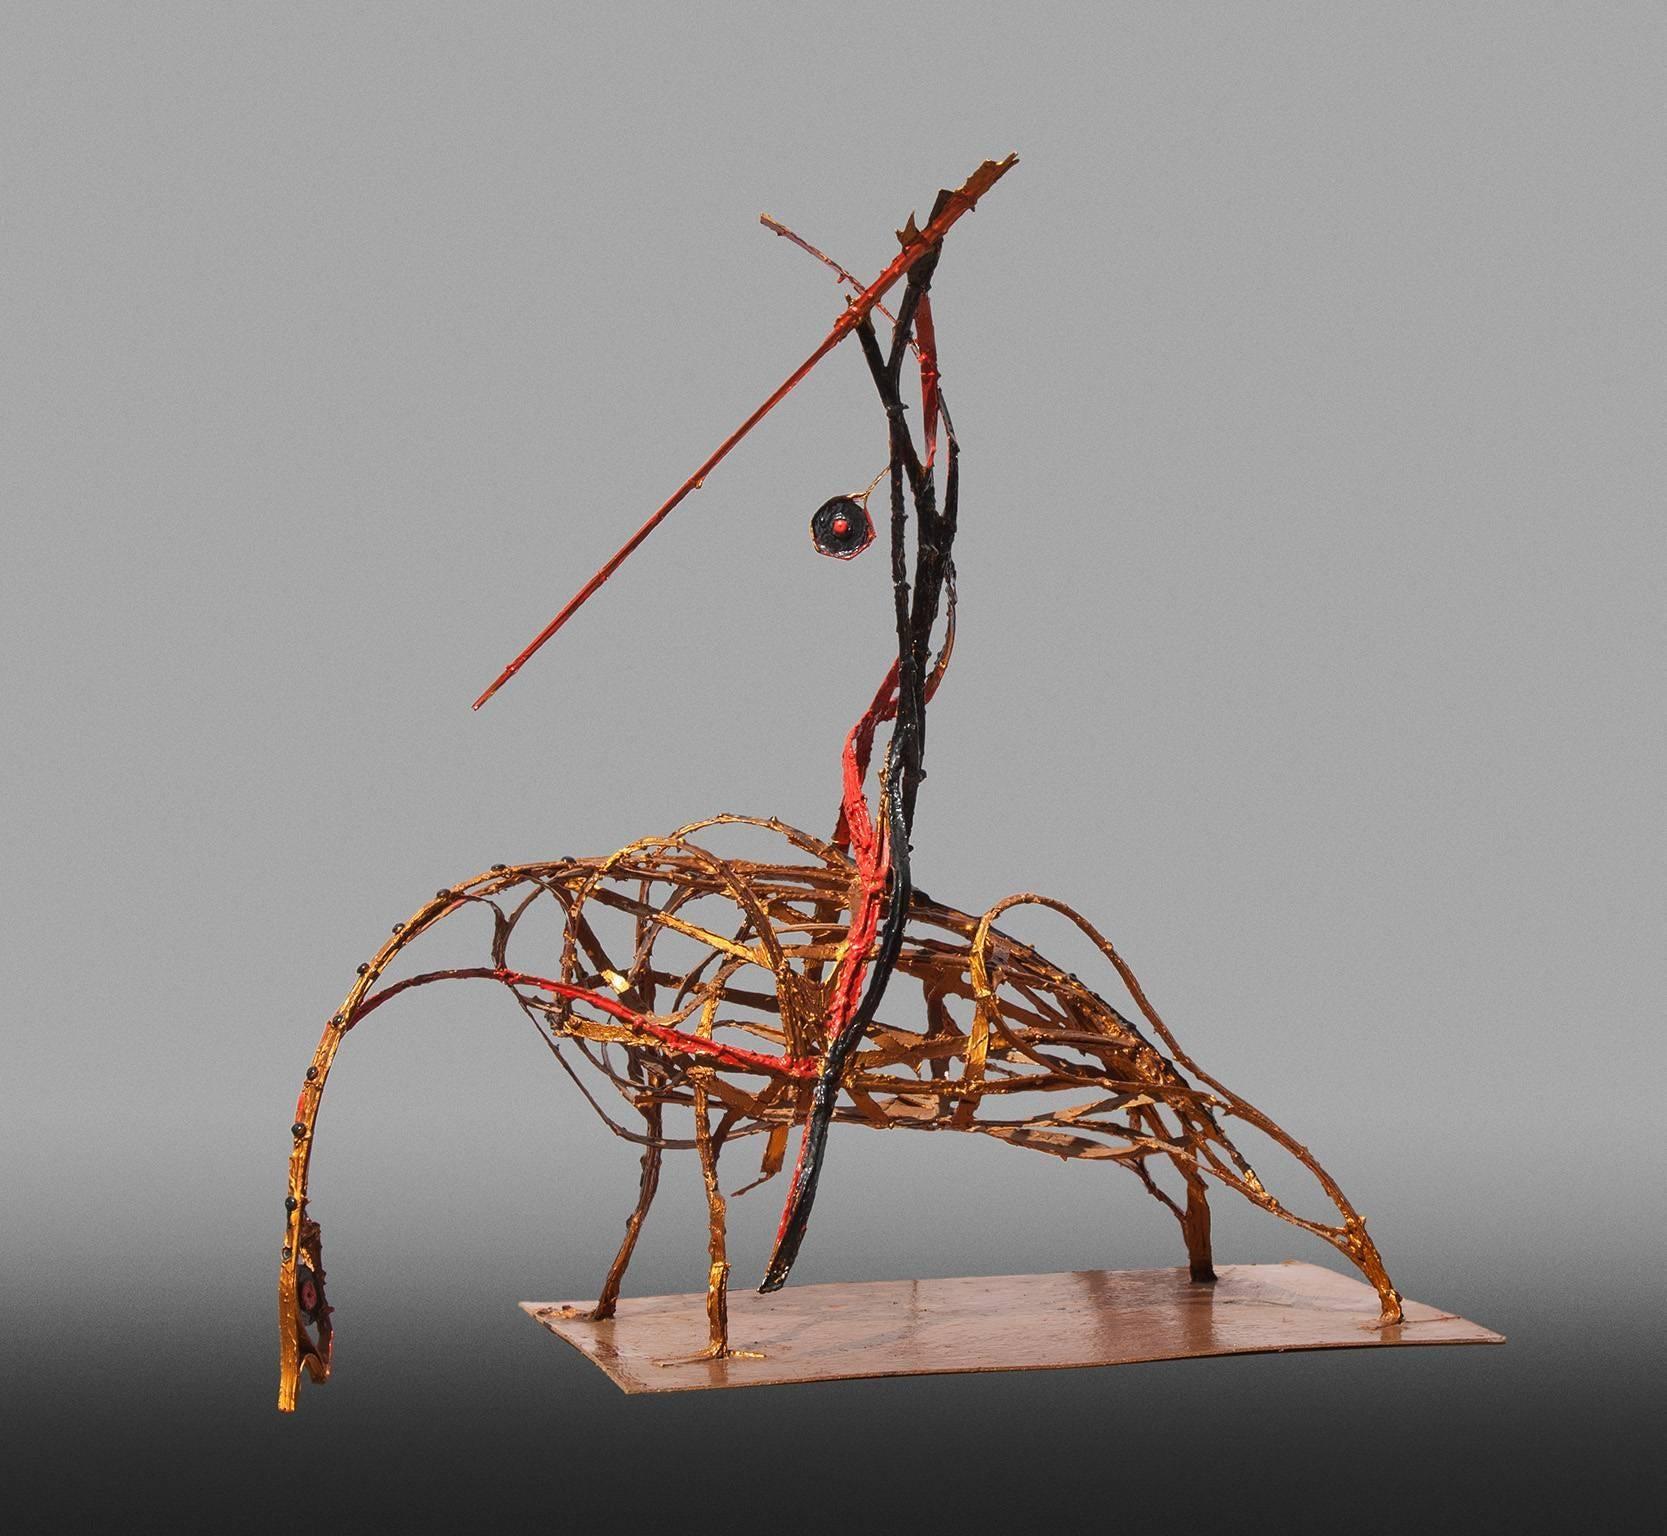 Picador (Bullfighter) - Resin and Metal Orange Sculpture of a Bullfighter